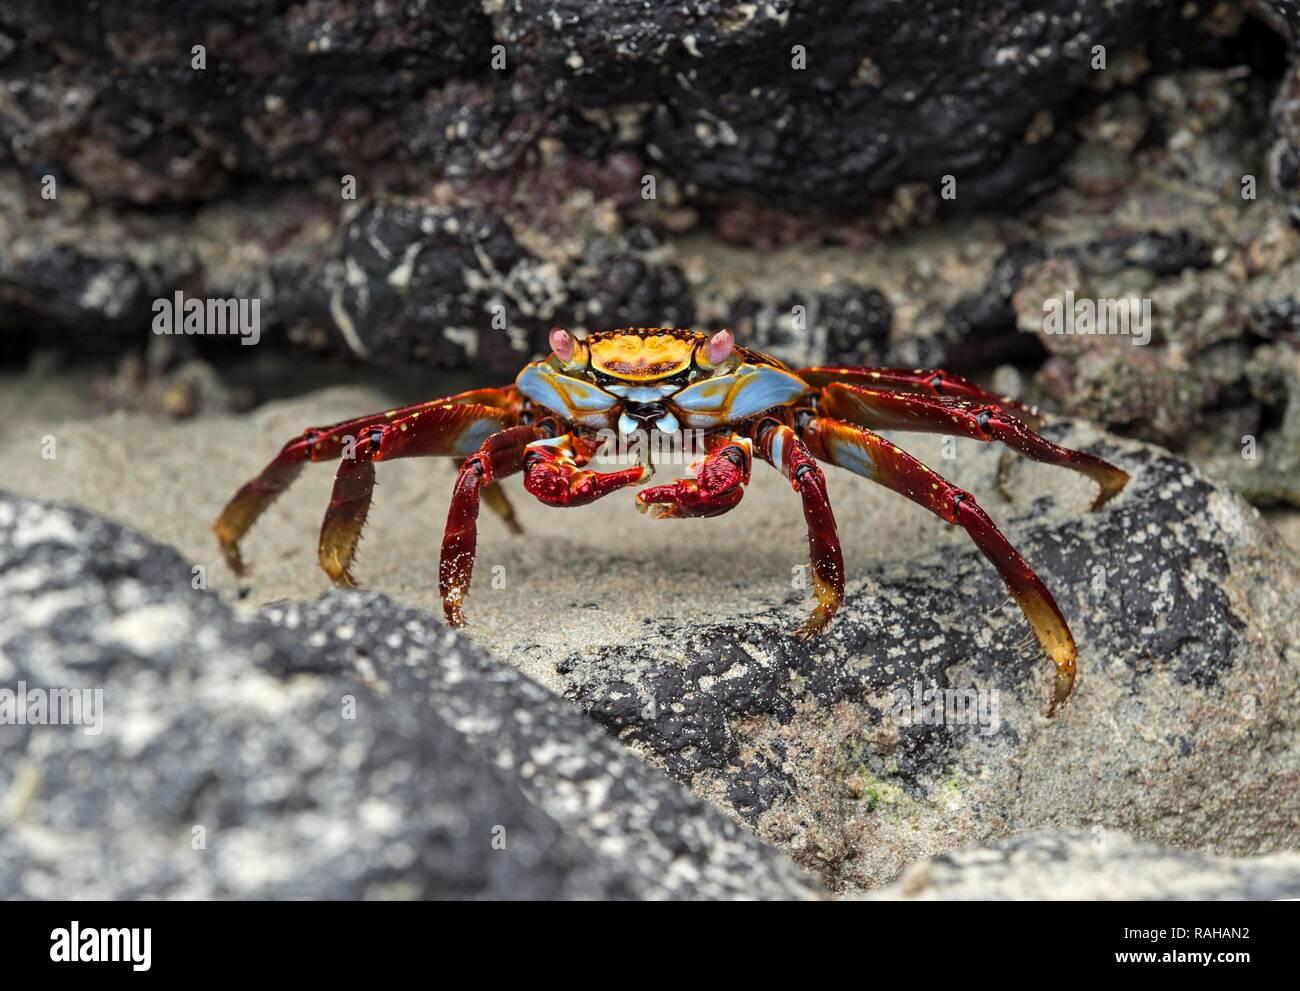 Red rock crab (Grapsus grapsus) on rock, Isabela Island, Galapagos Islands, Ecuador - Stock Image